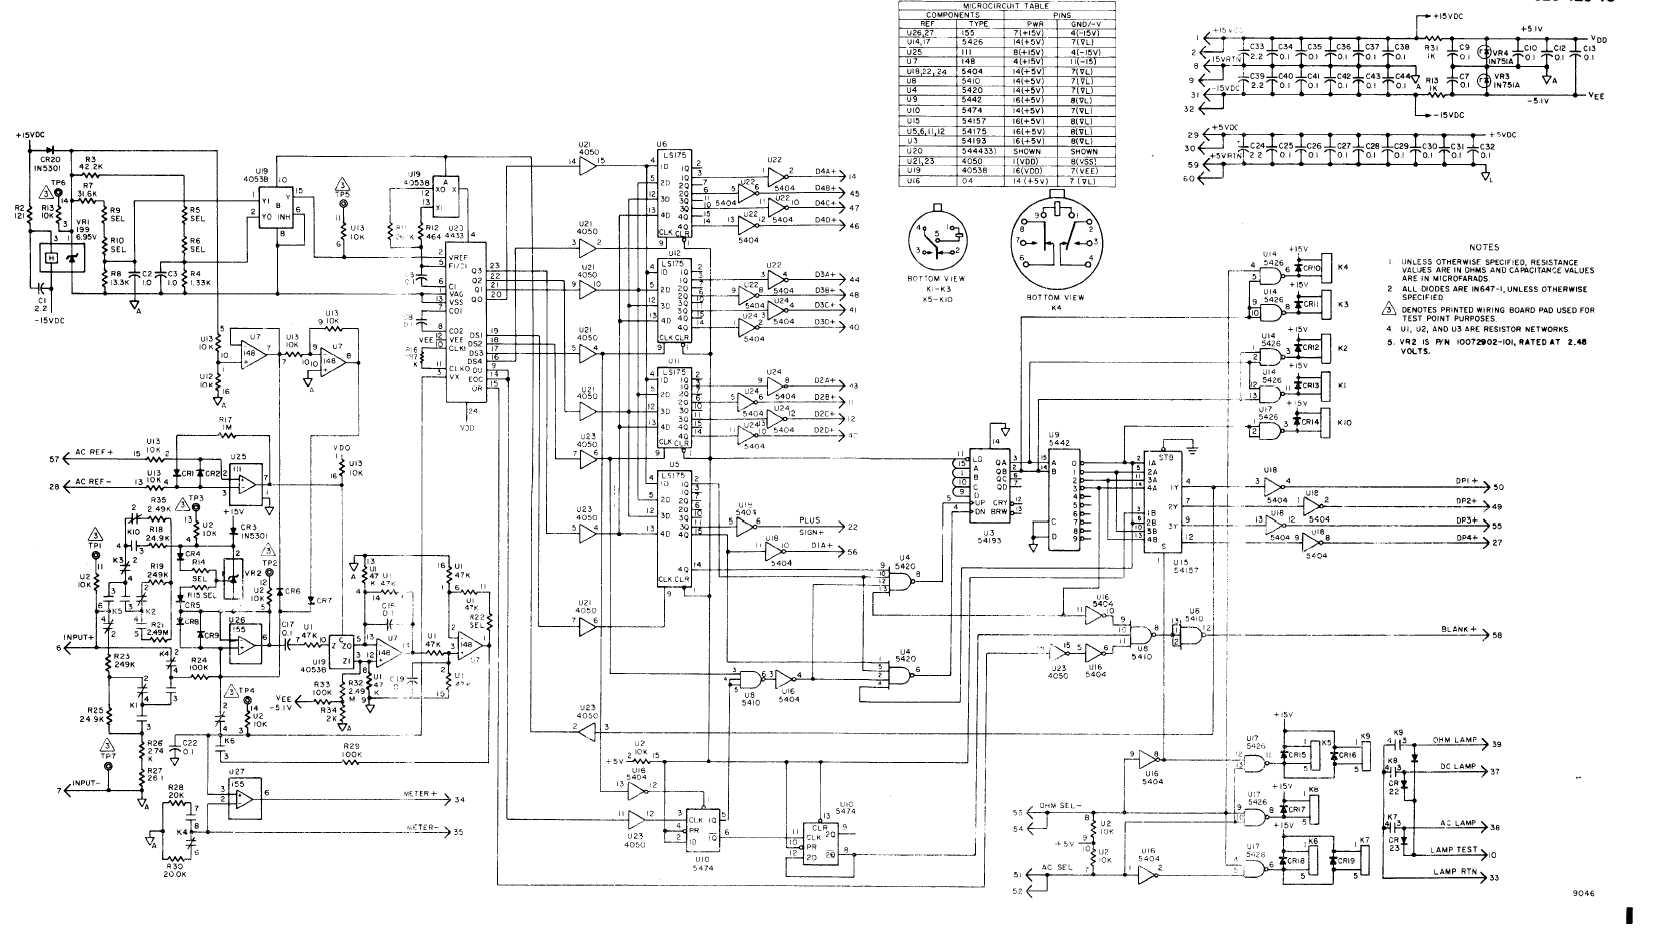 Digital multimeter dt9205a circuit diagram wiring diagram digital multimeter dt9205a circuit diagram multimeter schematic diagram wiring diagram ponents digital multimeter dt9205a circuit diagram wiring diagram buycottarizona